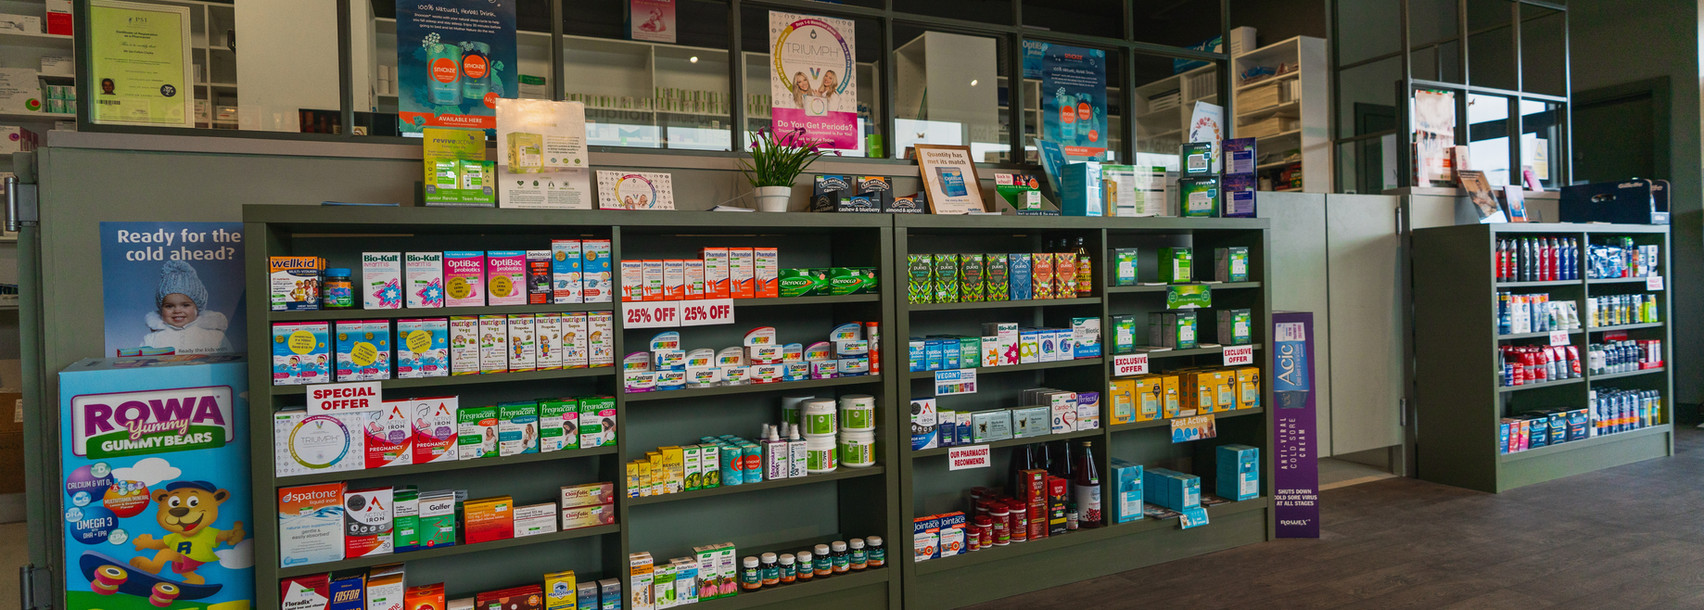 Zest Pharmacy Photos-4468.jpg